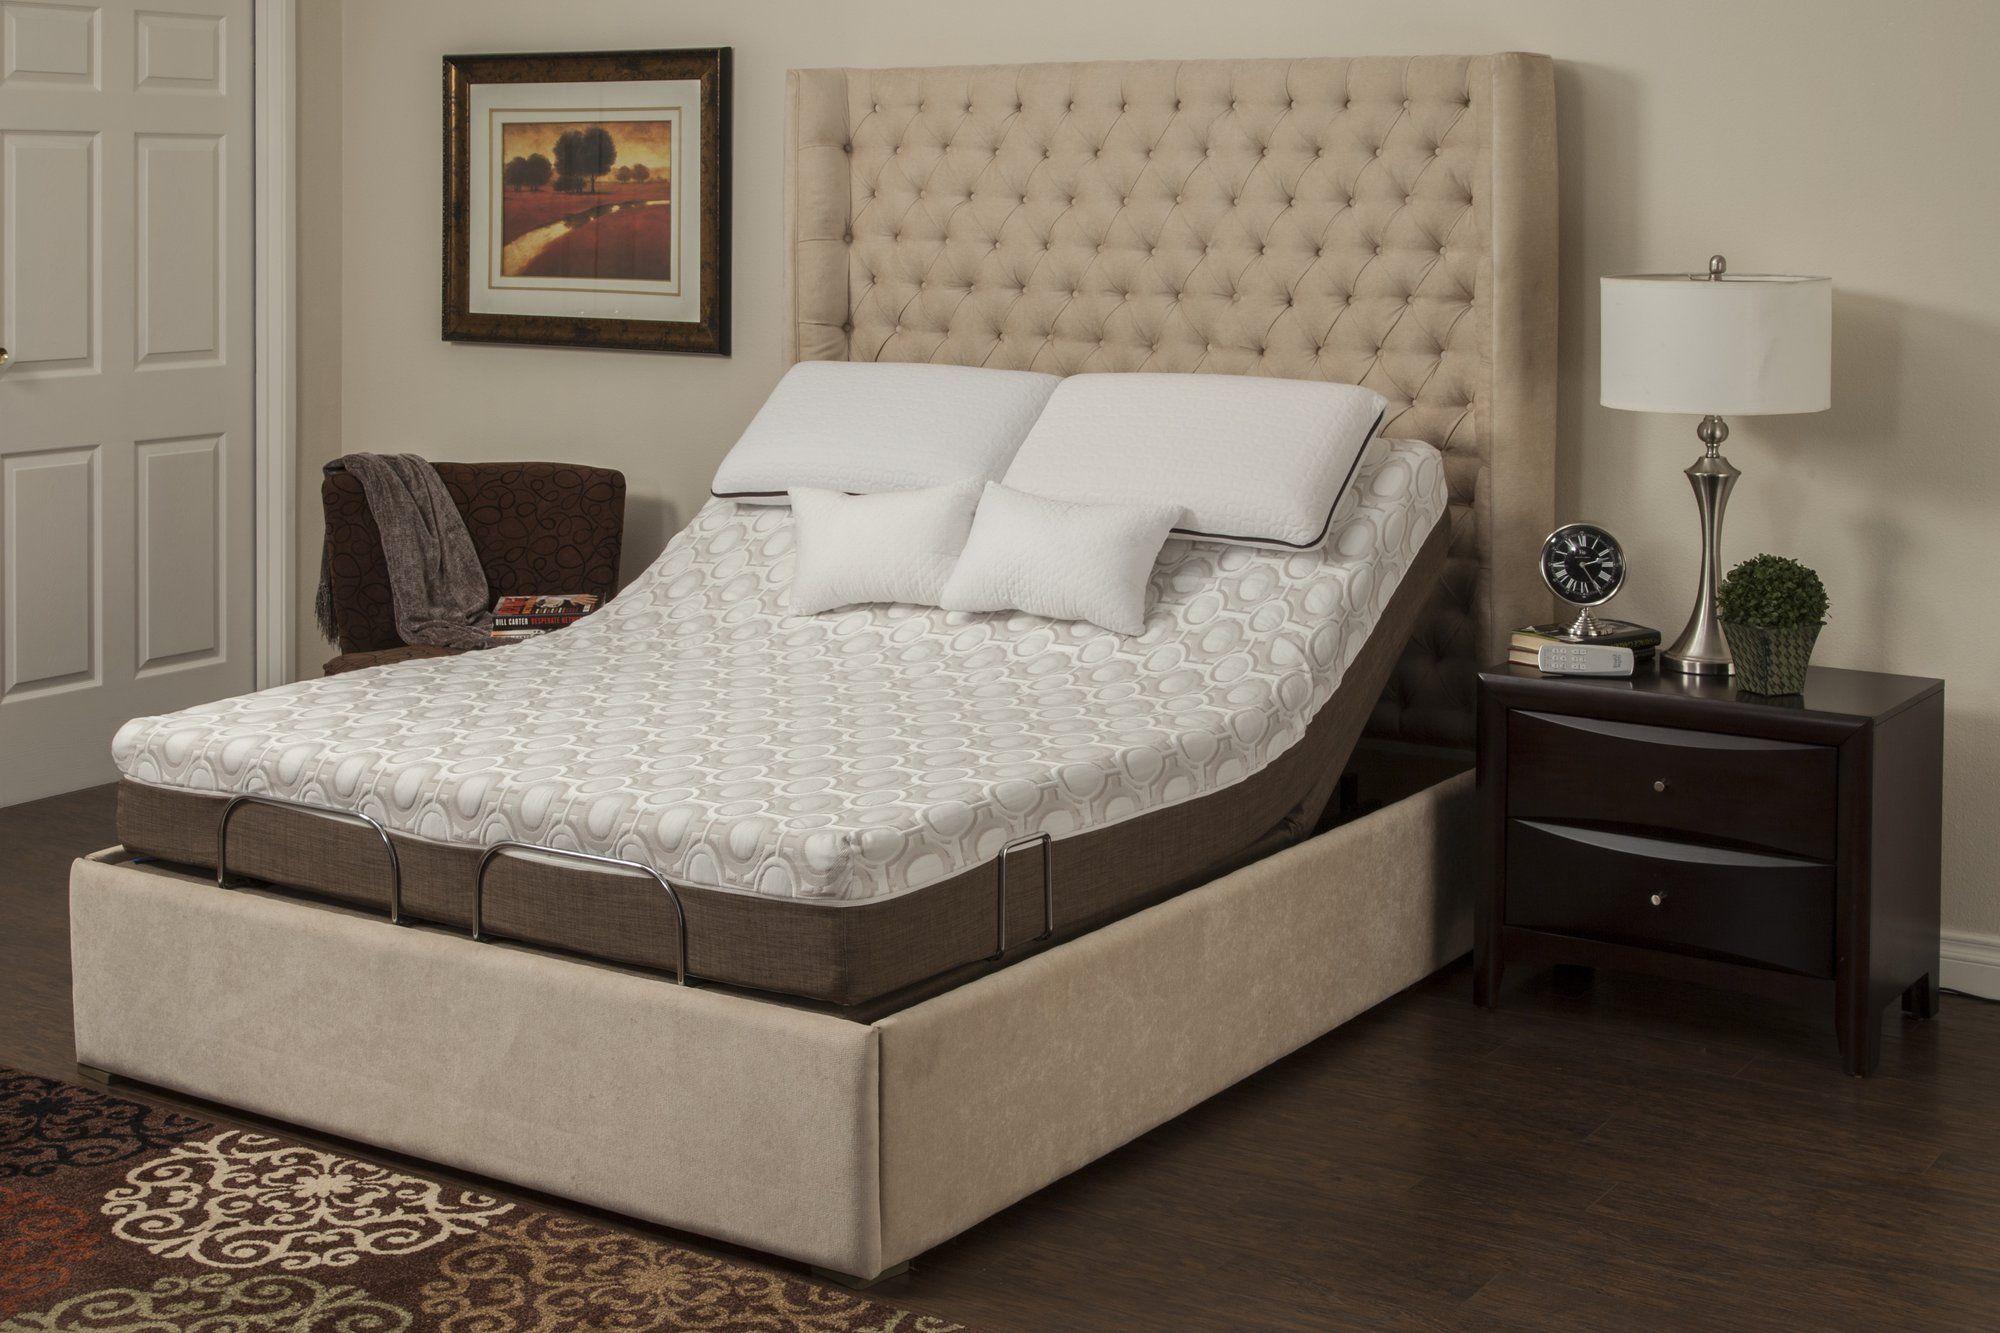 Peony Adjustable Bed Base And Mattress Adjustable Beds Mattress